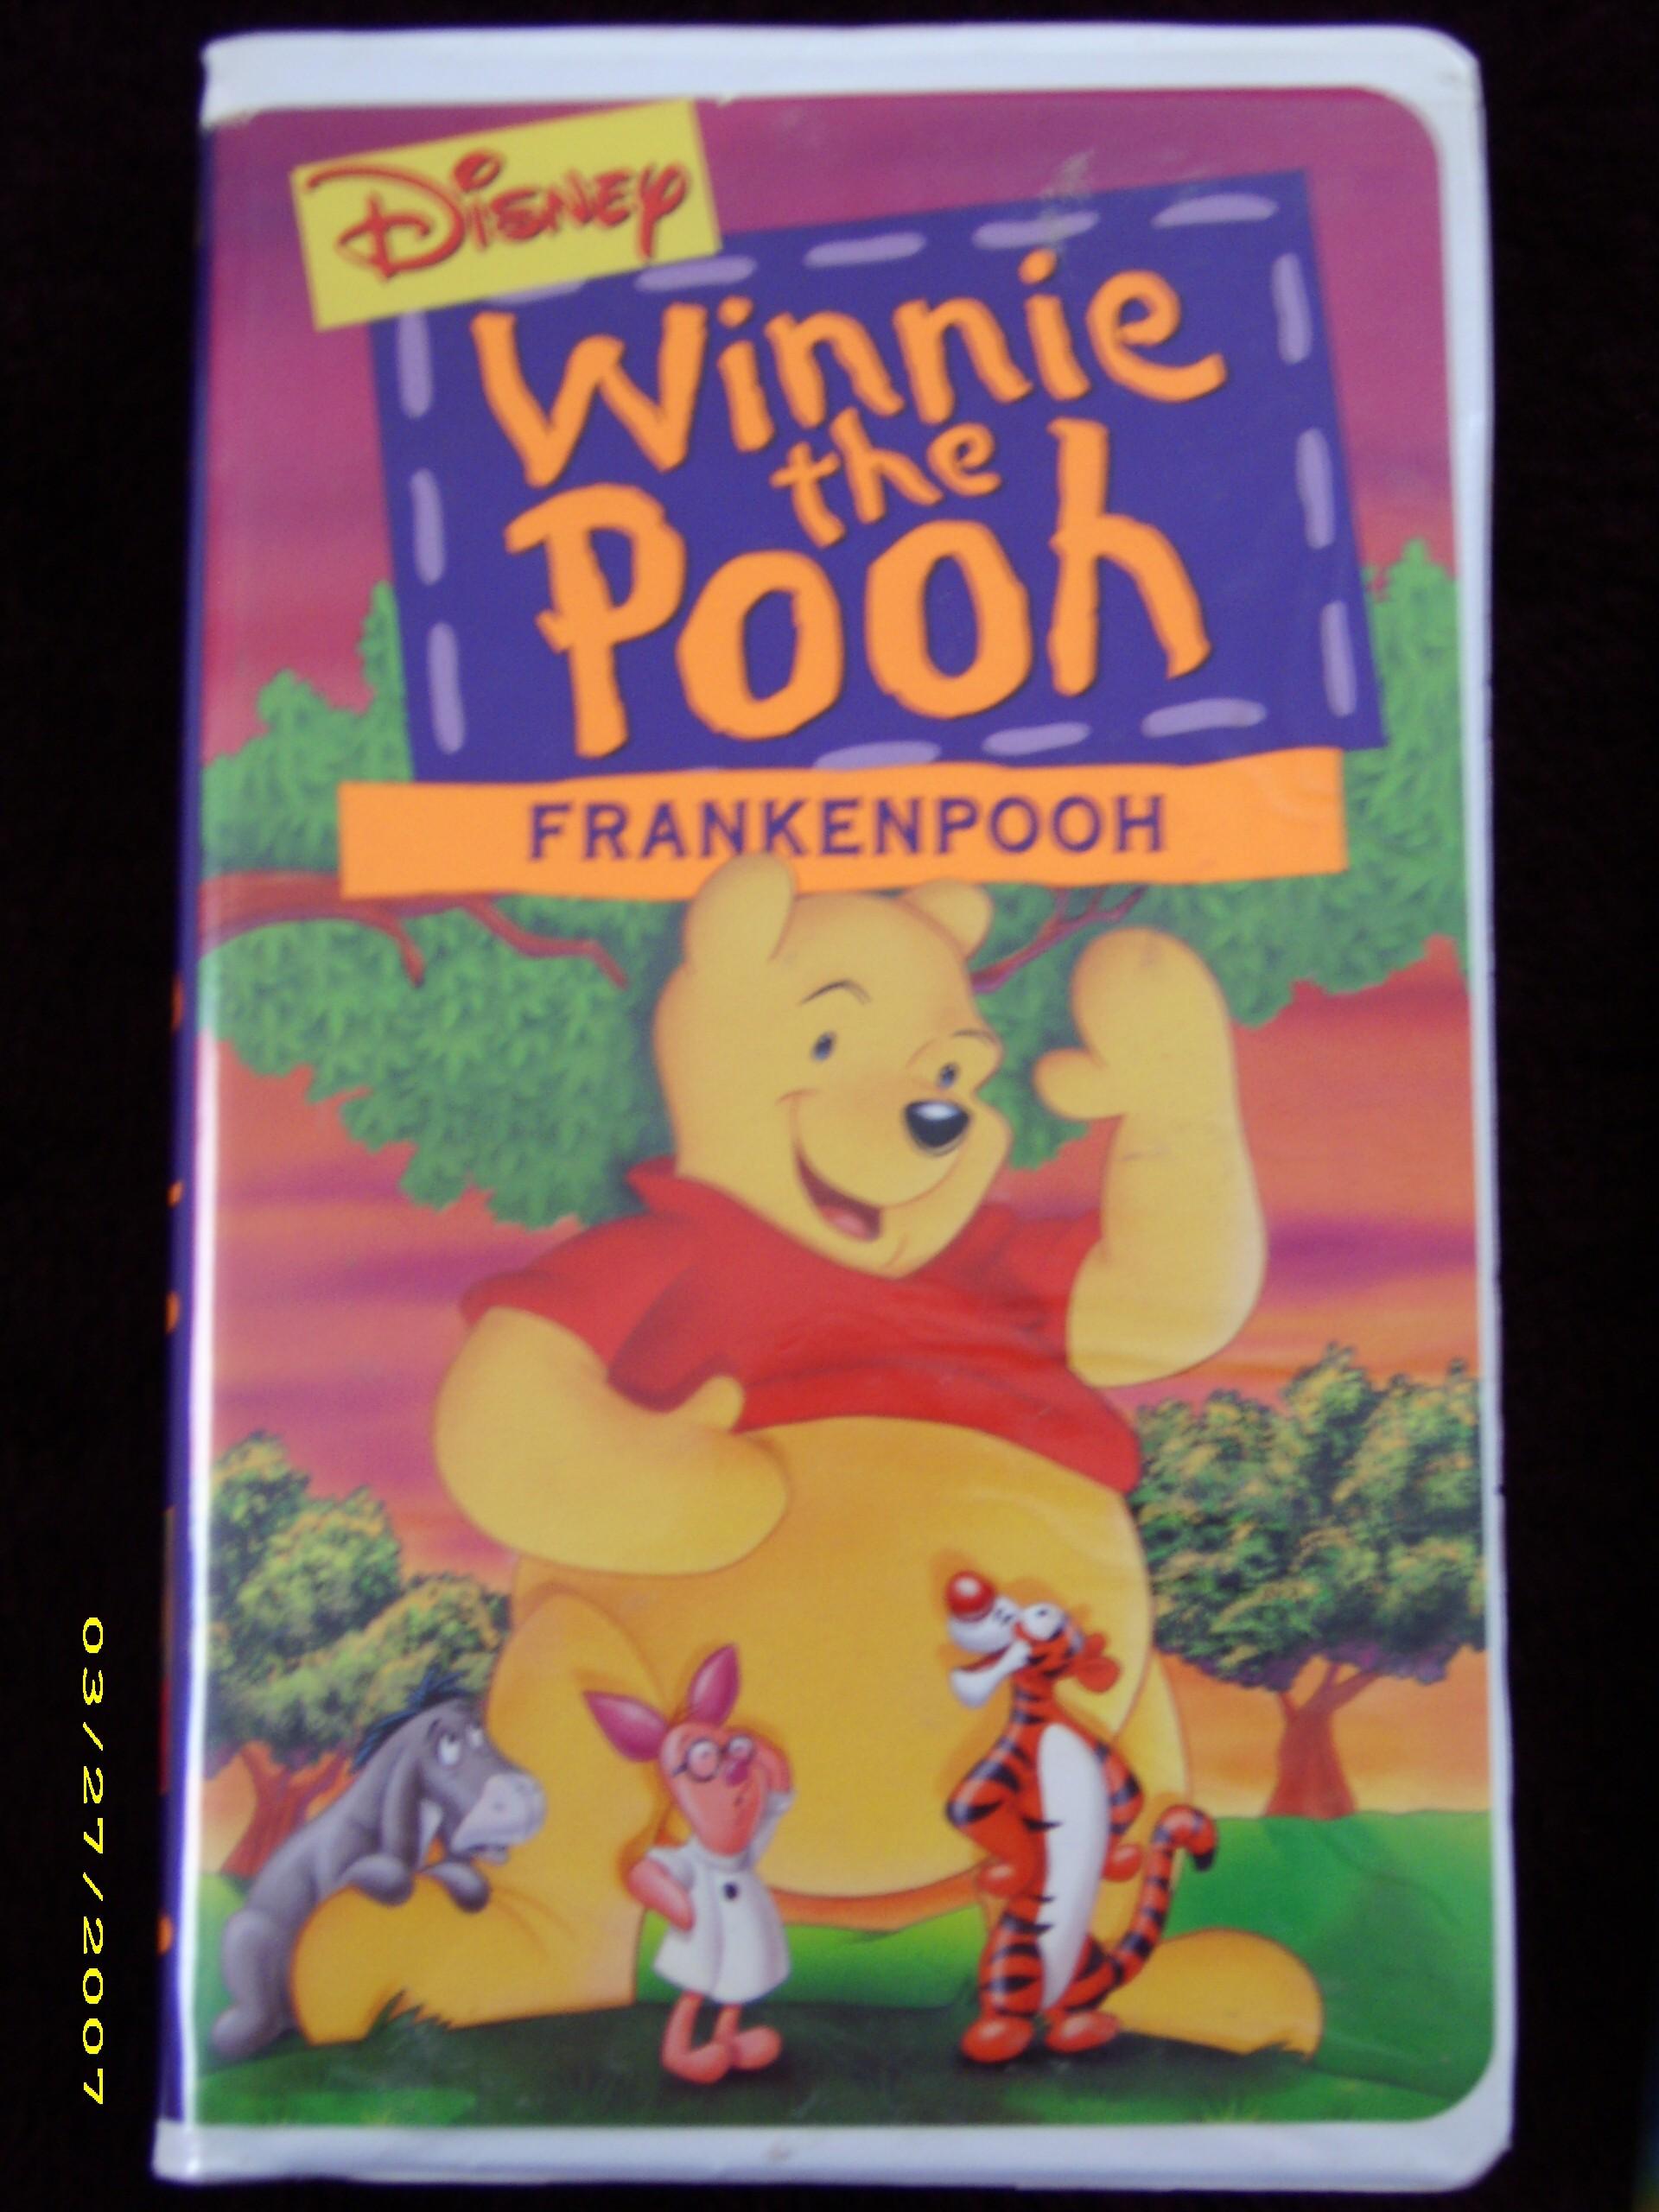 Winnie the pooh frankenpooh vhs